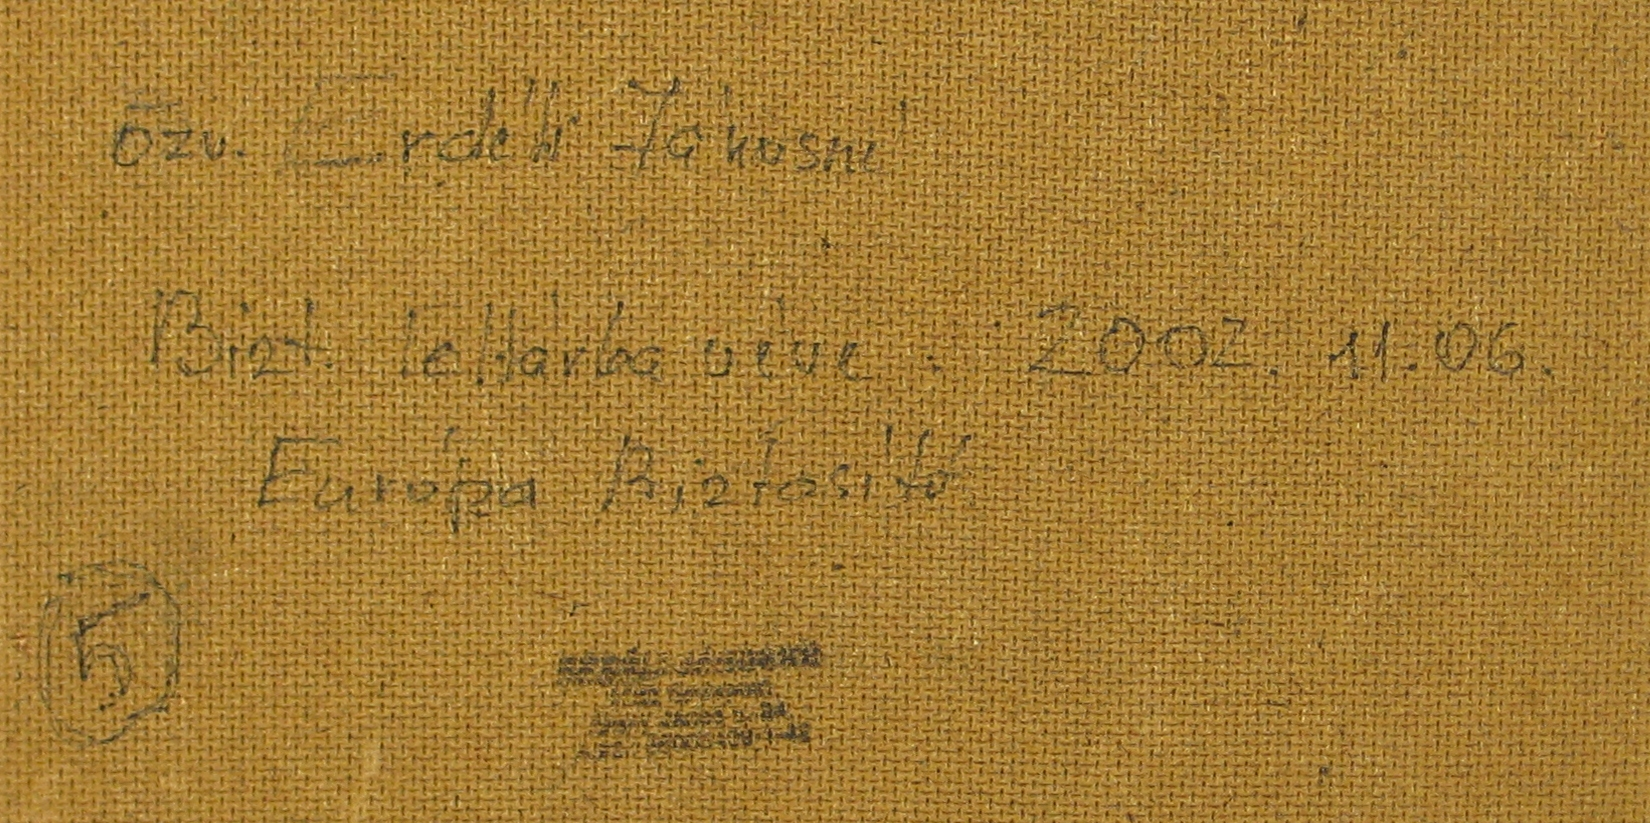 10-4c2.jpg (1650�823)